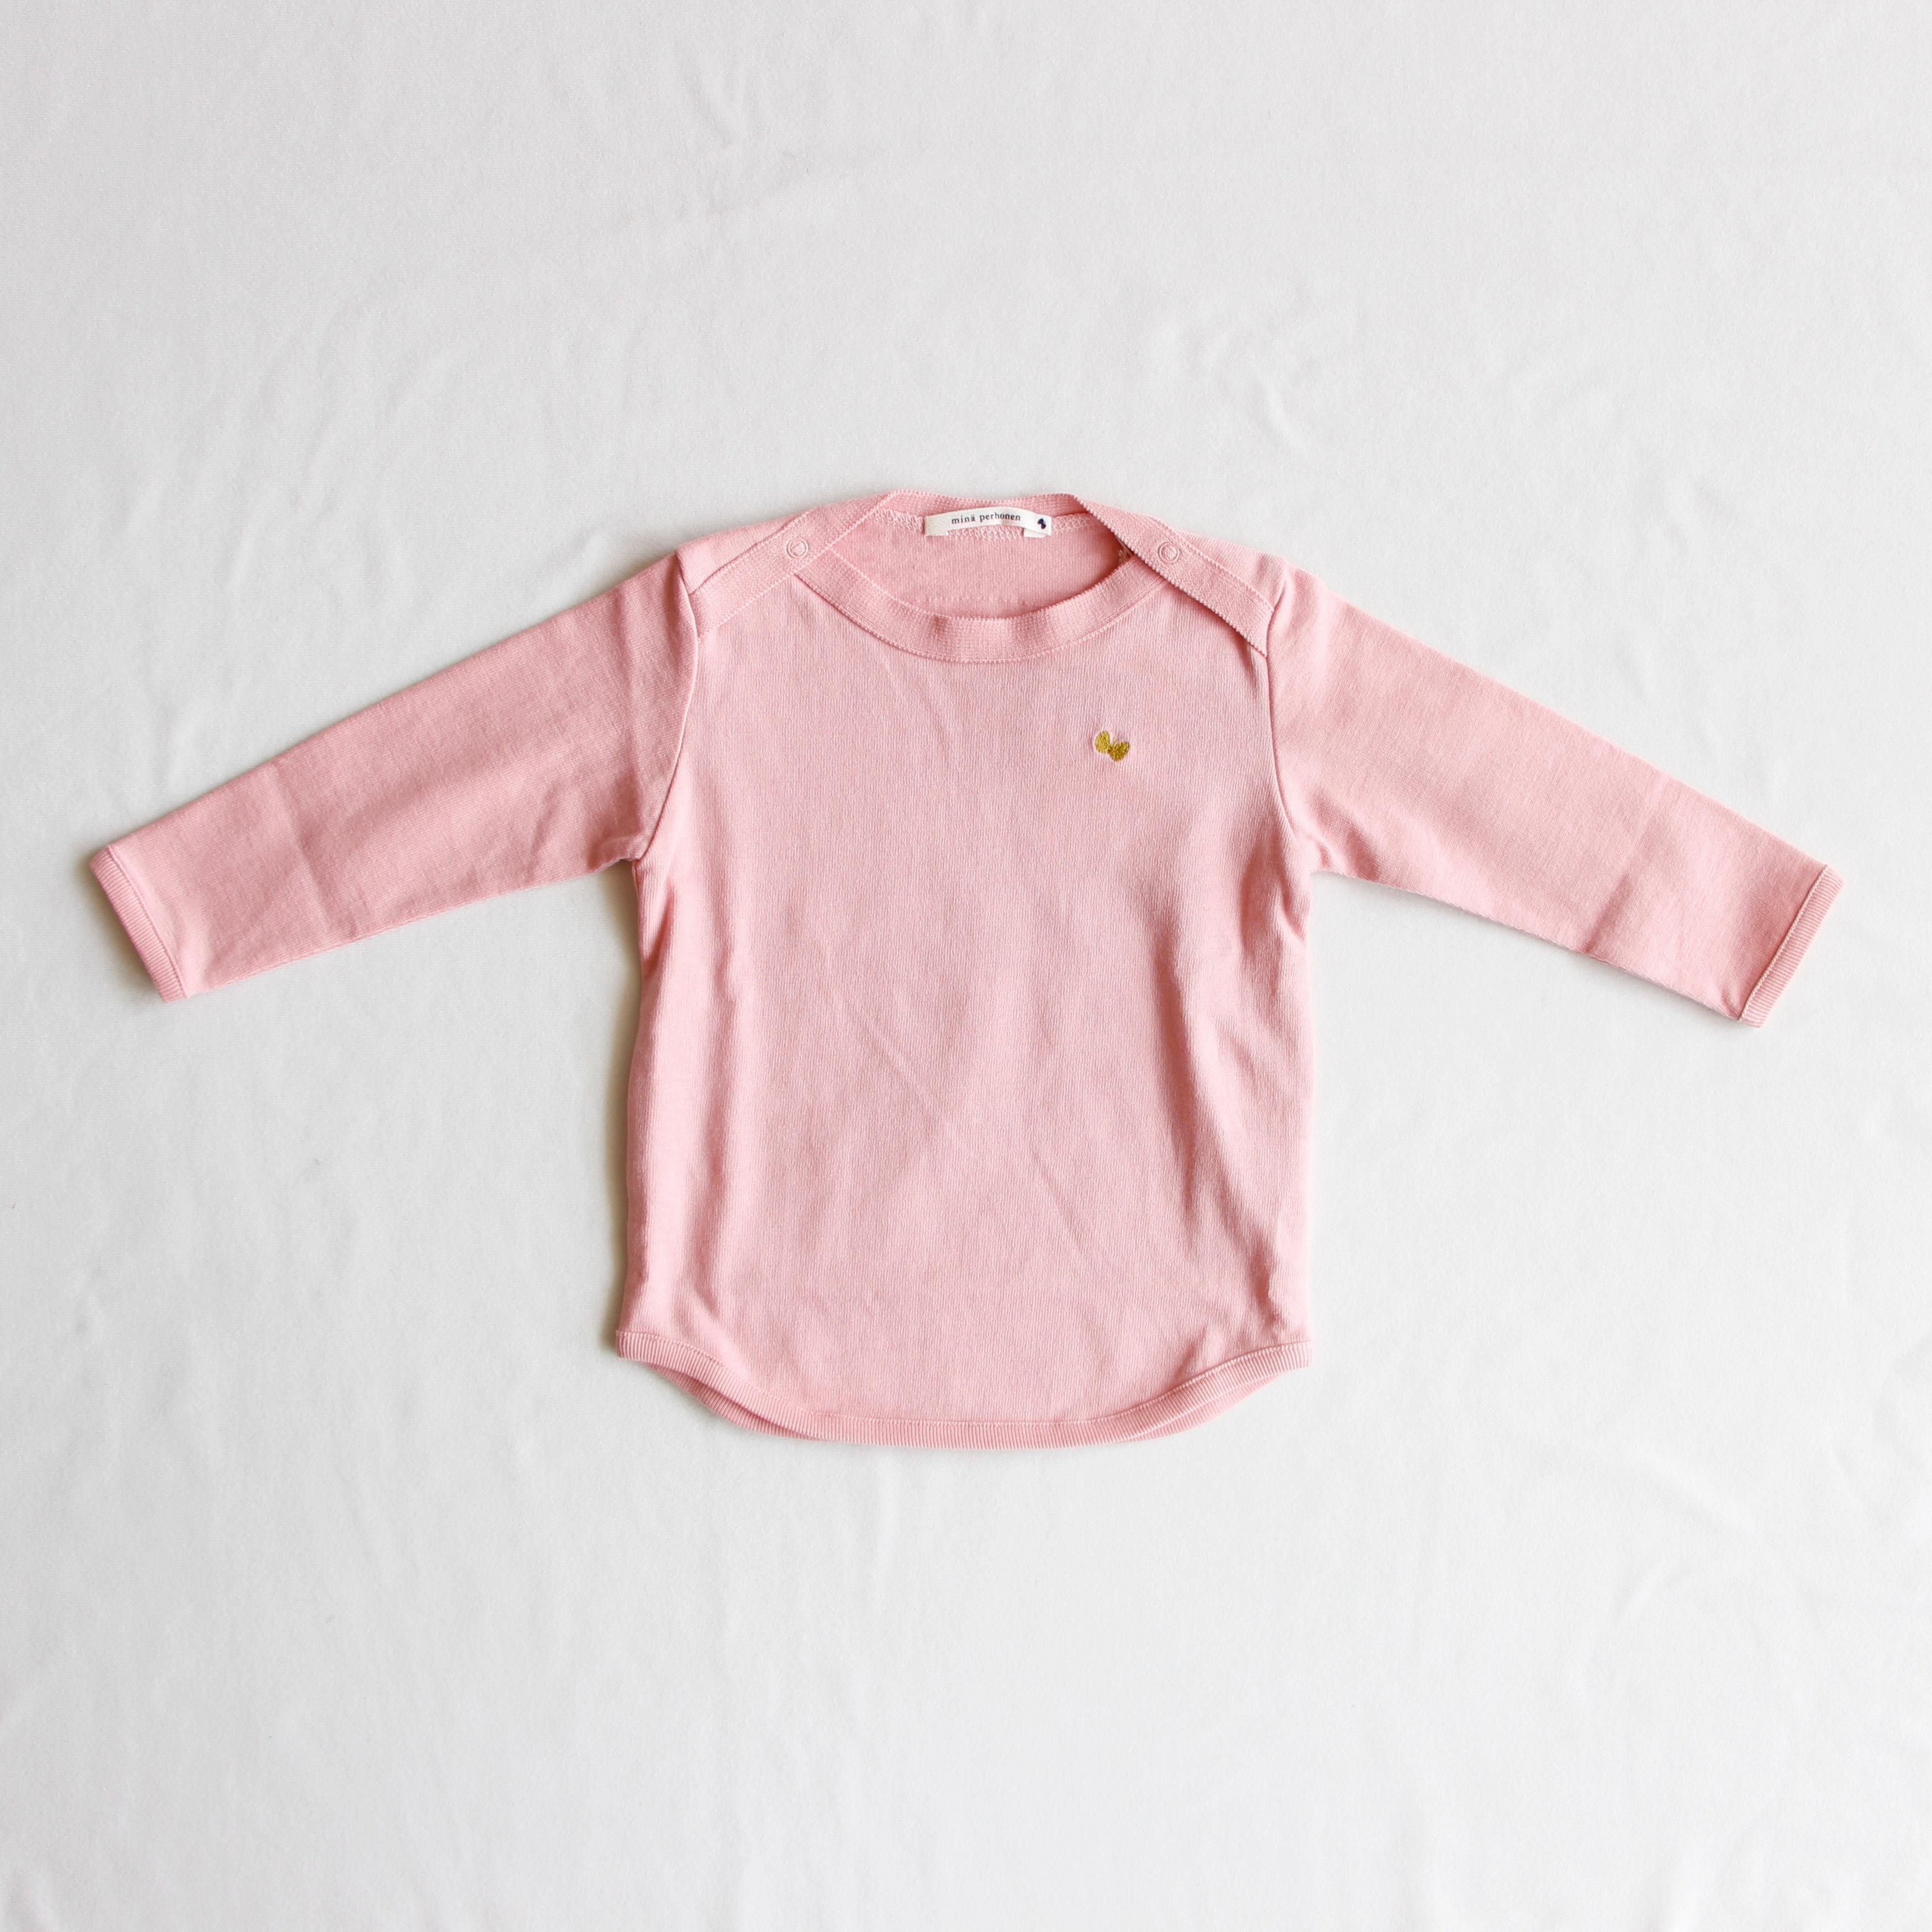 《mina perhonen 2018AW》zutto 長袖カットソー / pink / 80-100cm